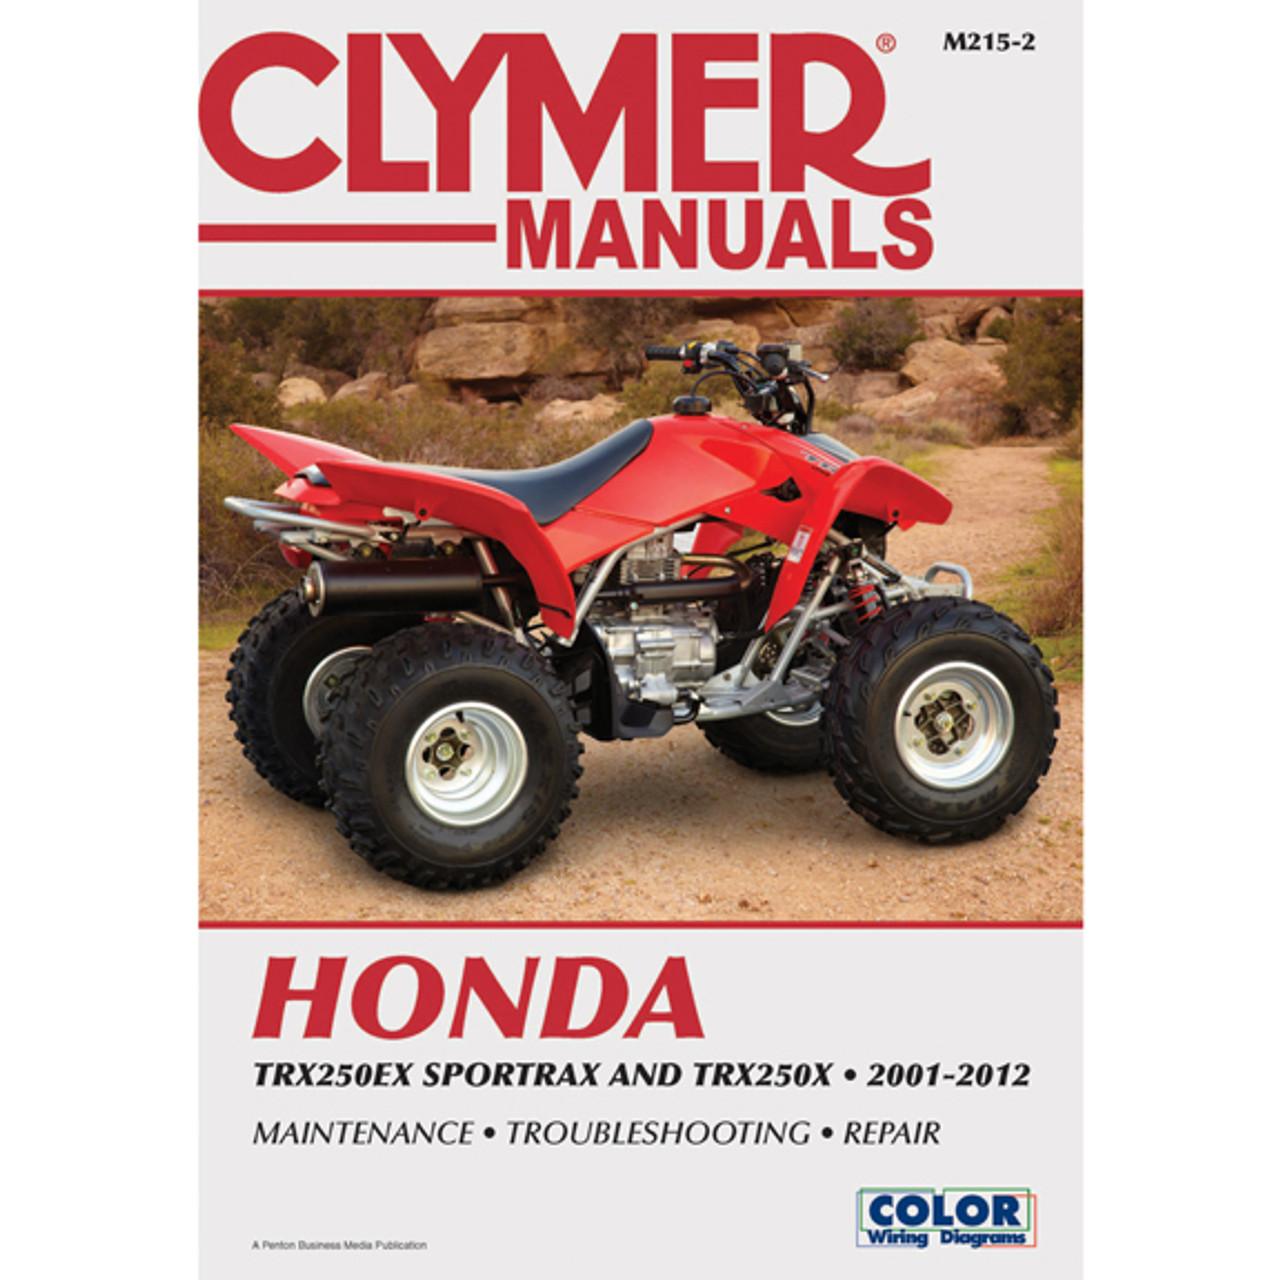 clymer m215 2 service shop repair manual honda trx250ex sportrax rh speedaddicts com 1987 honda trx250x service manual free download trx250ex service manual pdf